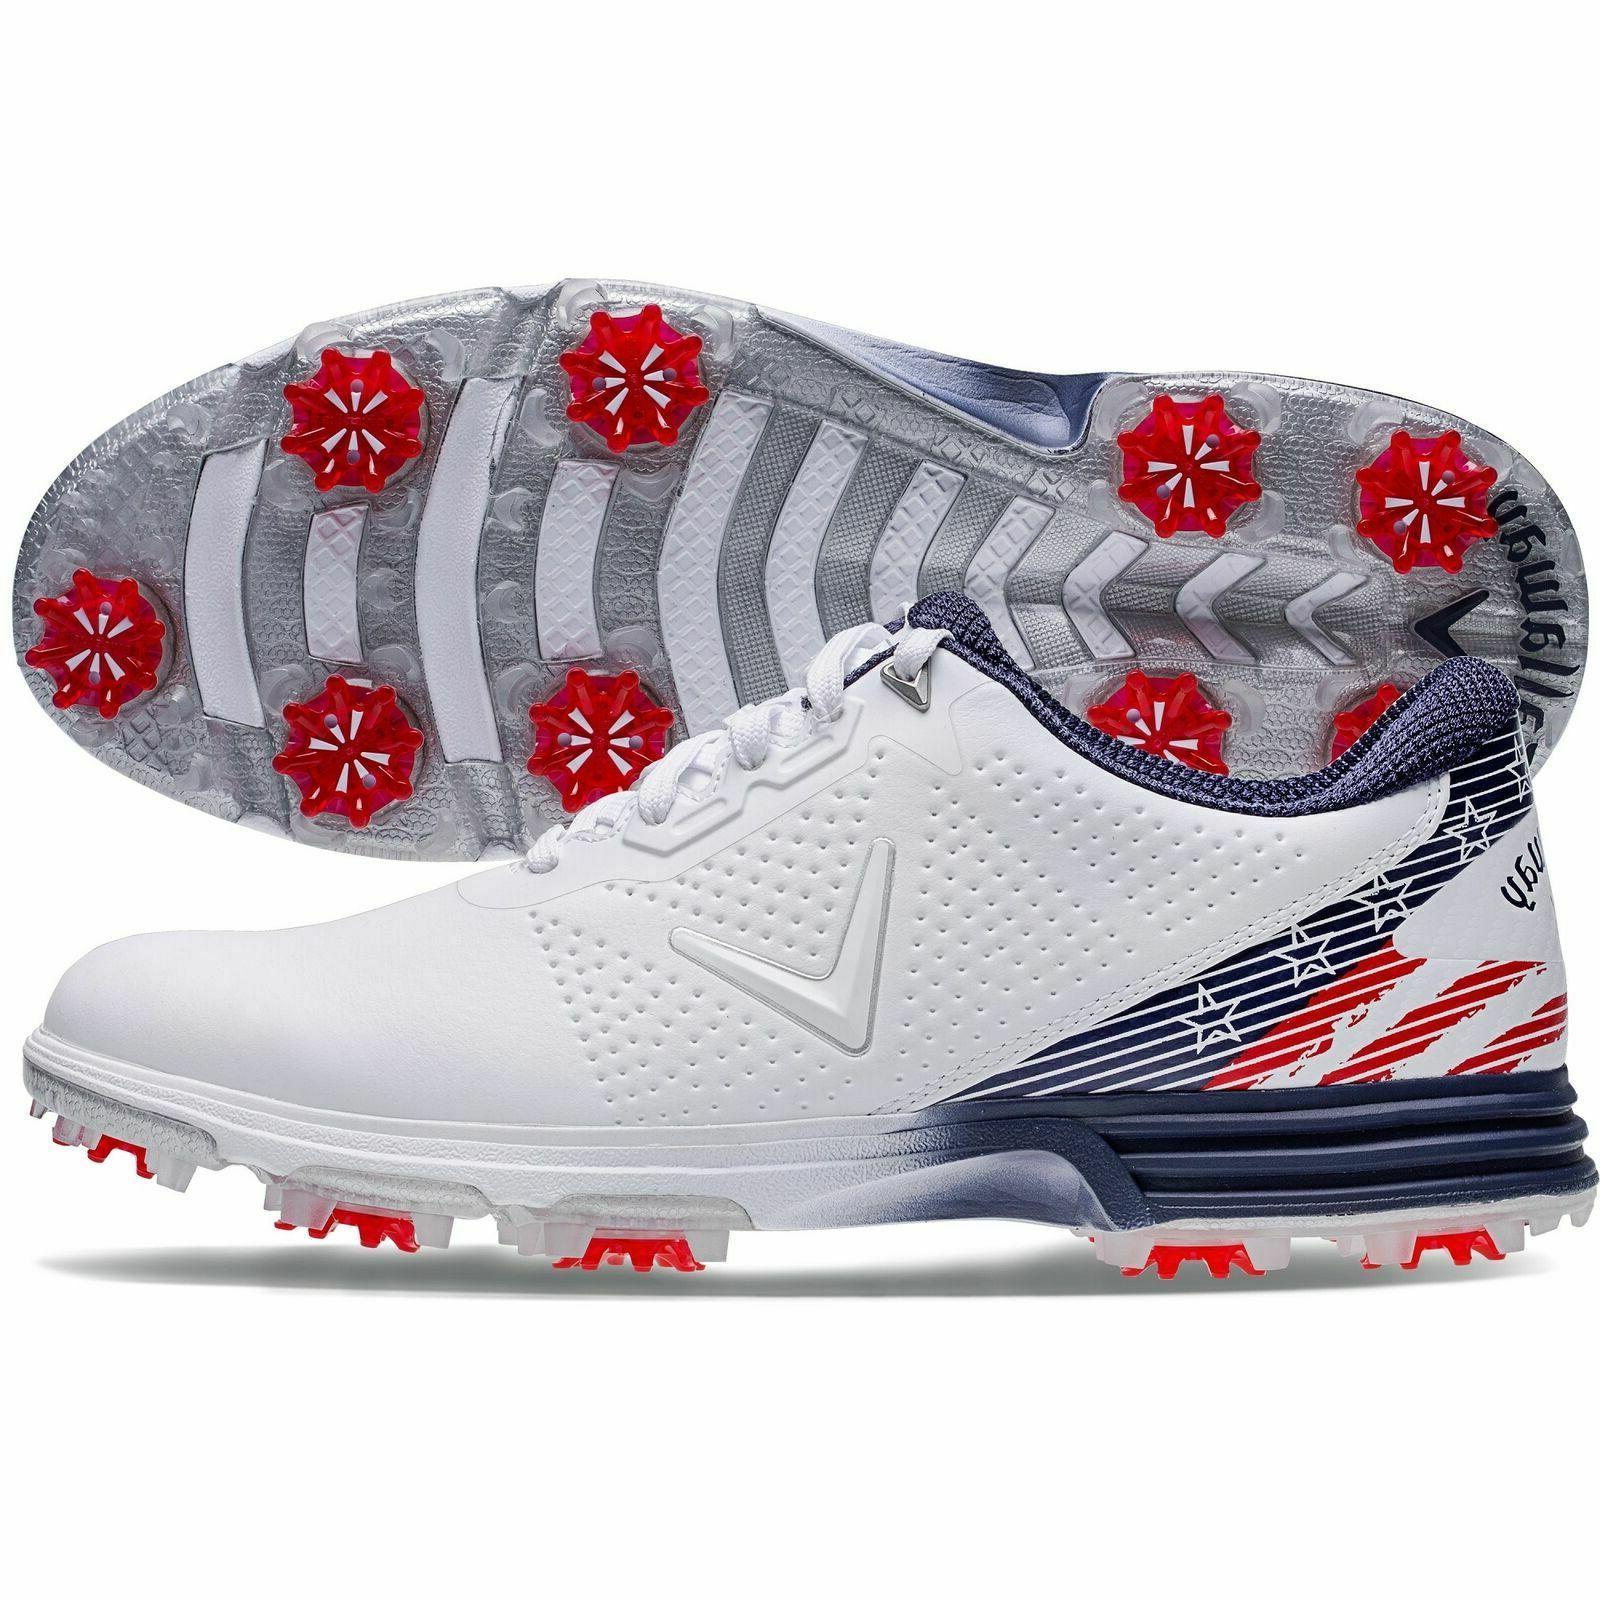 new golf coronado shoes medium red white